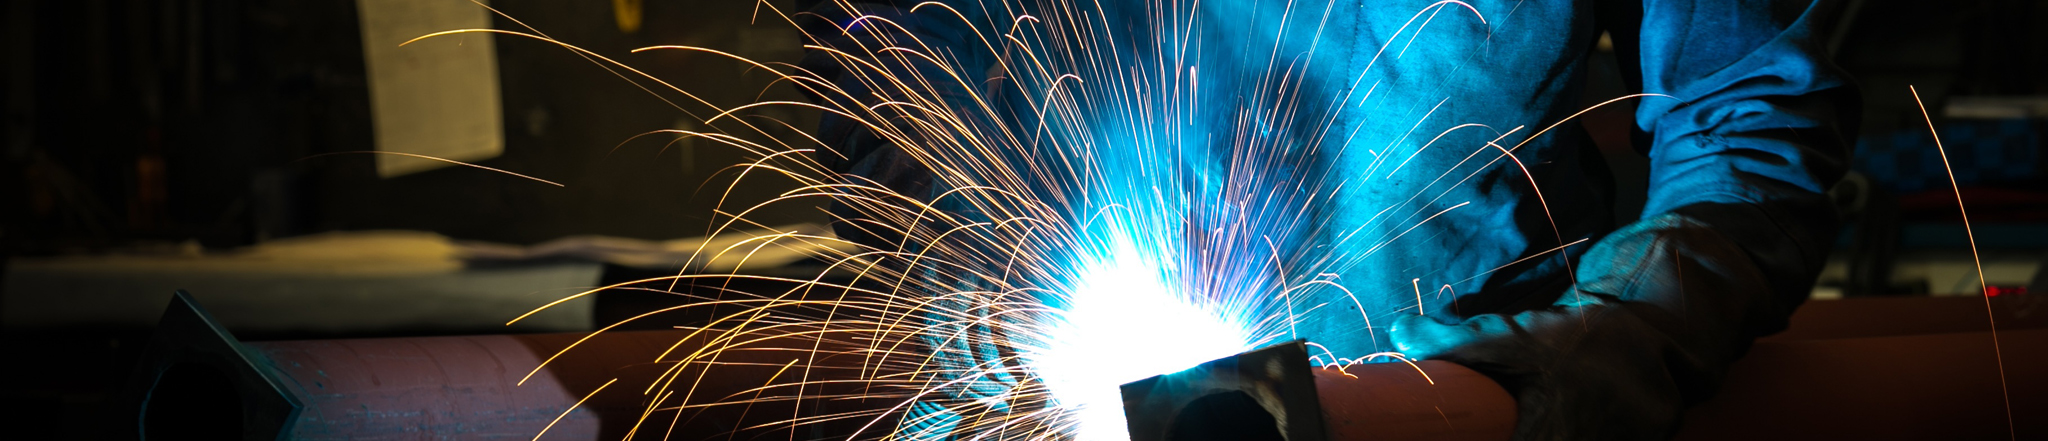 Man using welding torch to cut metal sheet in workshop.